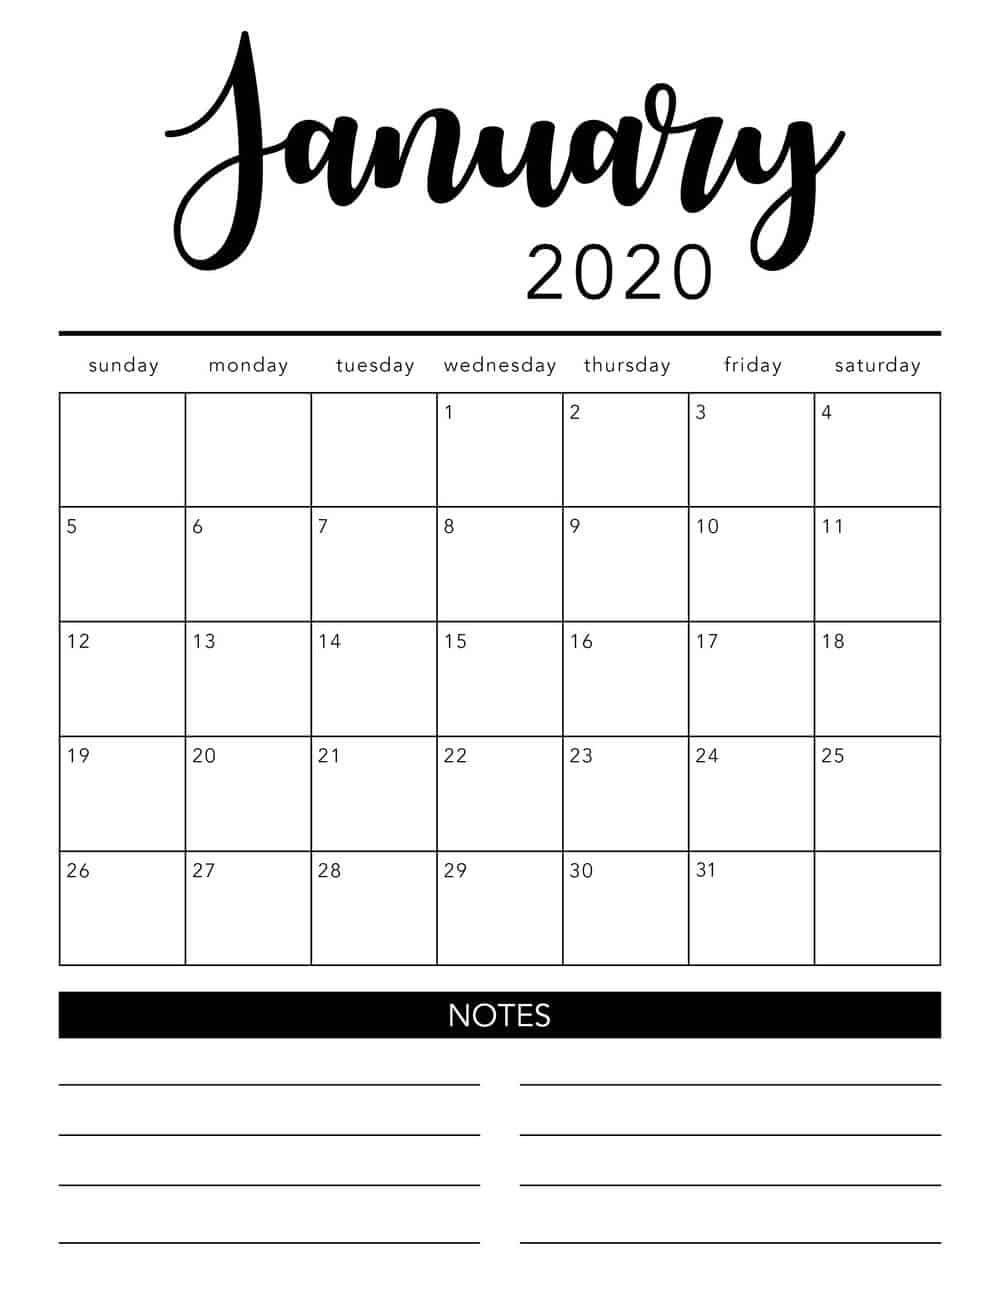 Free 2020 Printable Calendar Template (2 Colors!) - I Heart